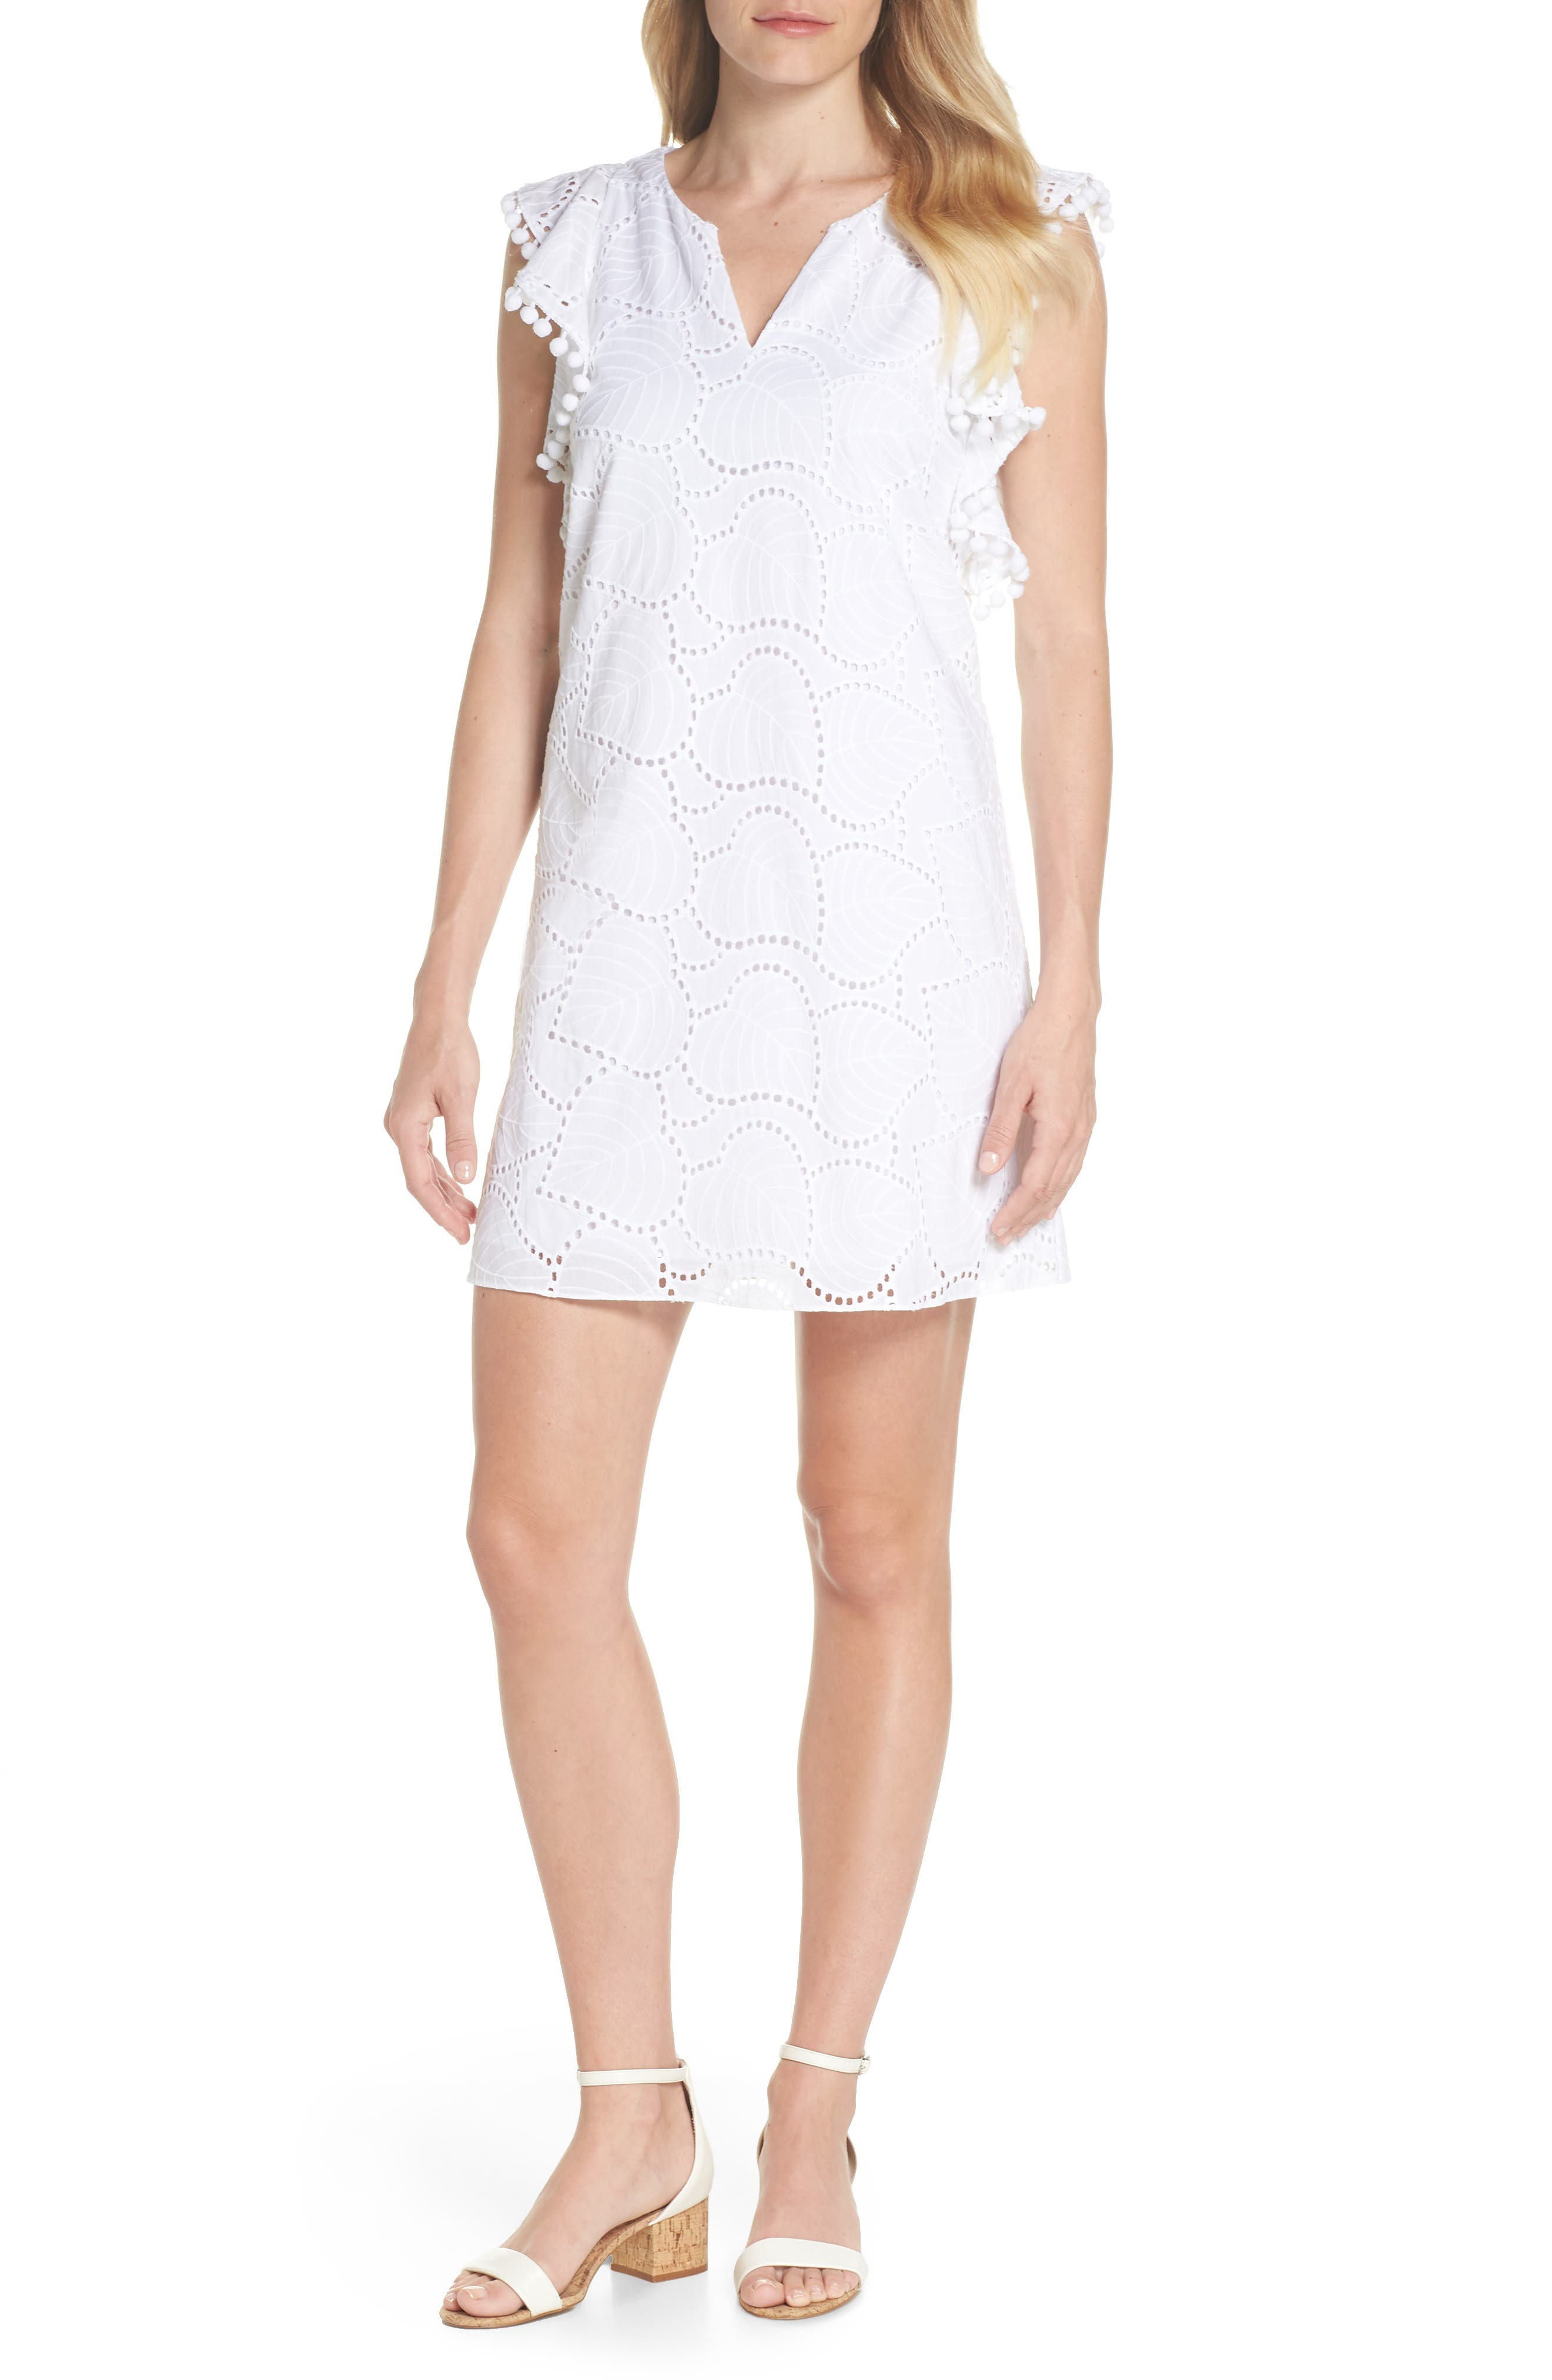 Astara Cotton Eyelet Dress,                         Main,                         color, Resort White Leaf Eyelet